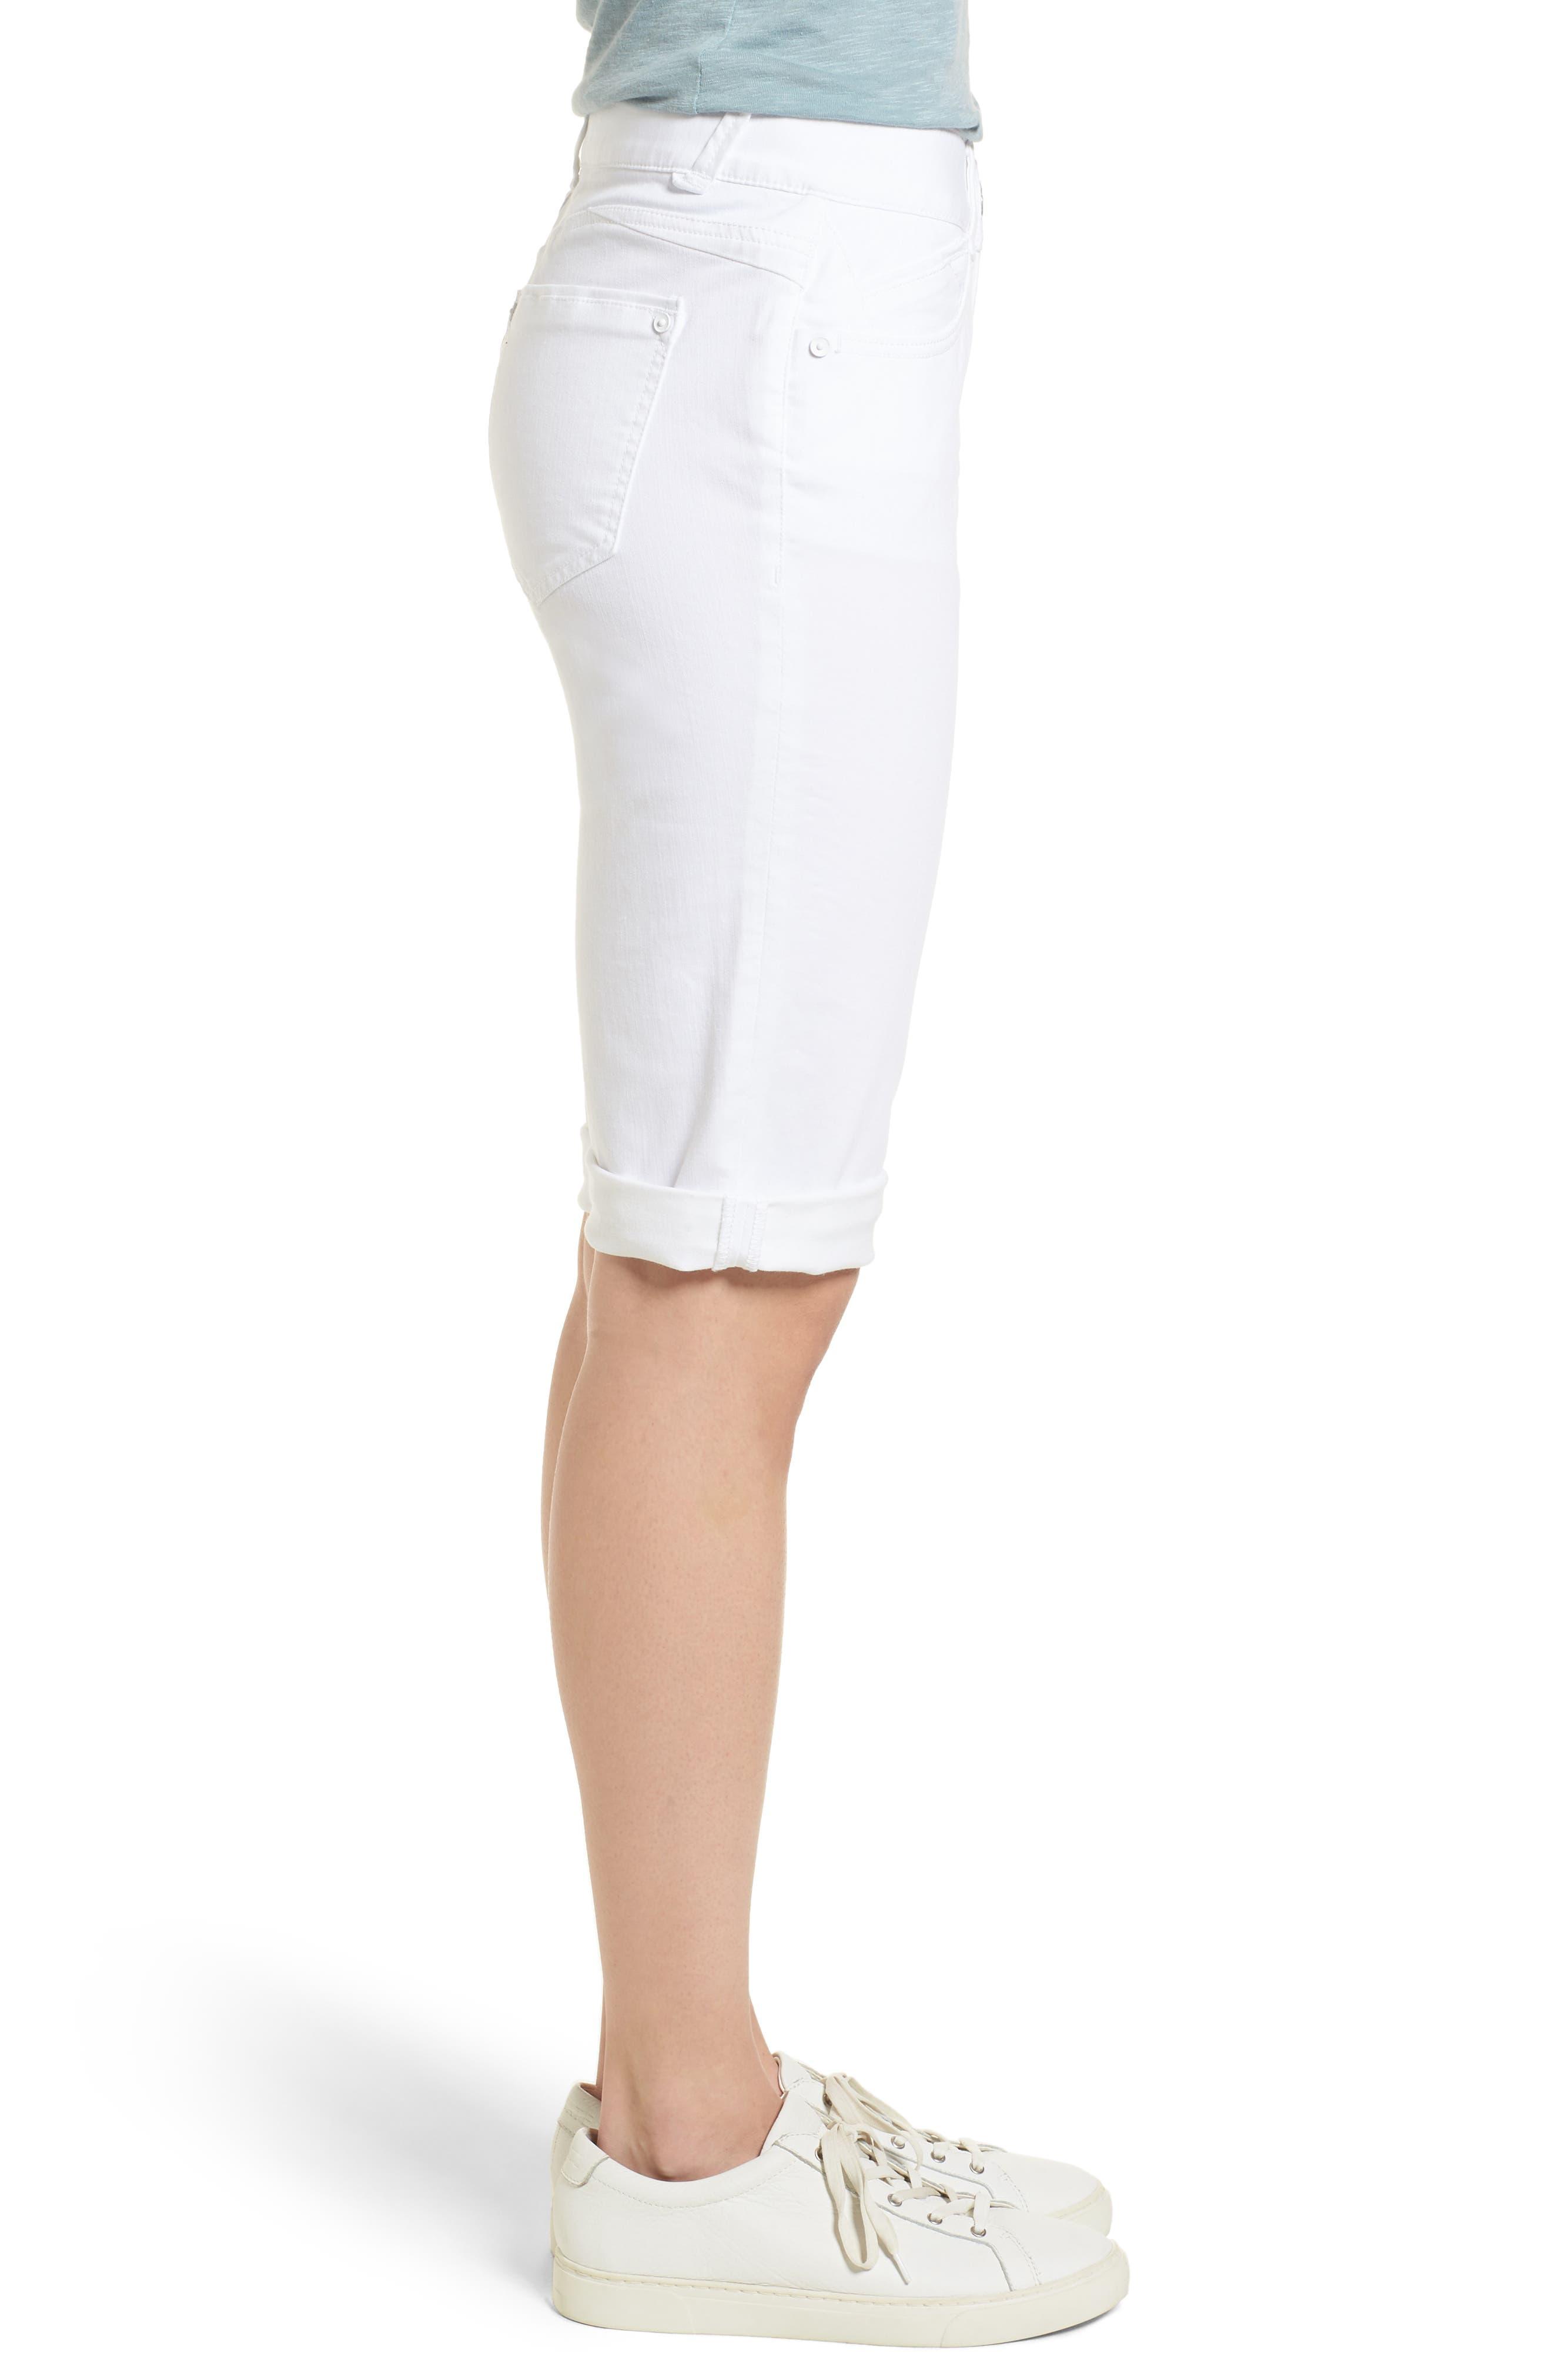 Ab-solution White Bermuda Shorts,                             Alternate thumbnail 3, color,                             OPTIC WHITE